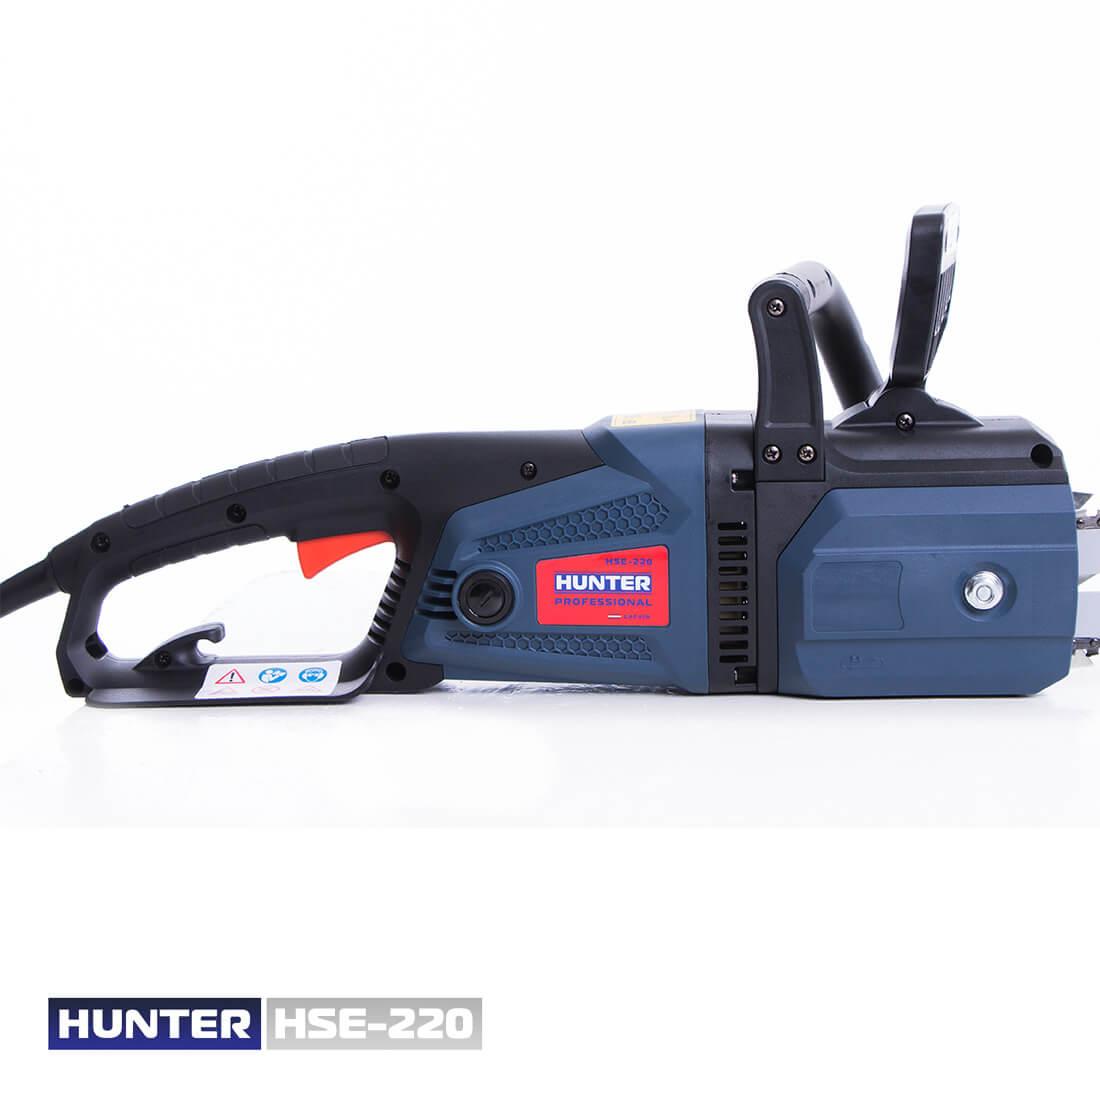 Фото Hunter HSE-240 цена 2400грн №6 — Hunter